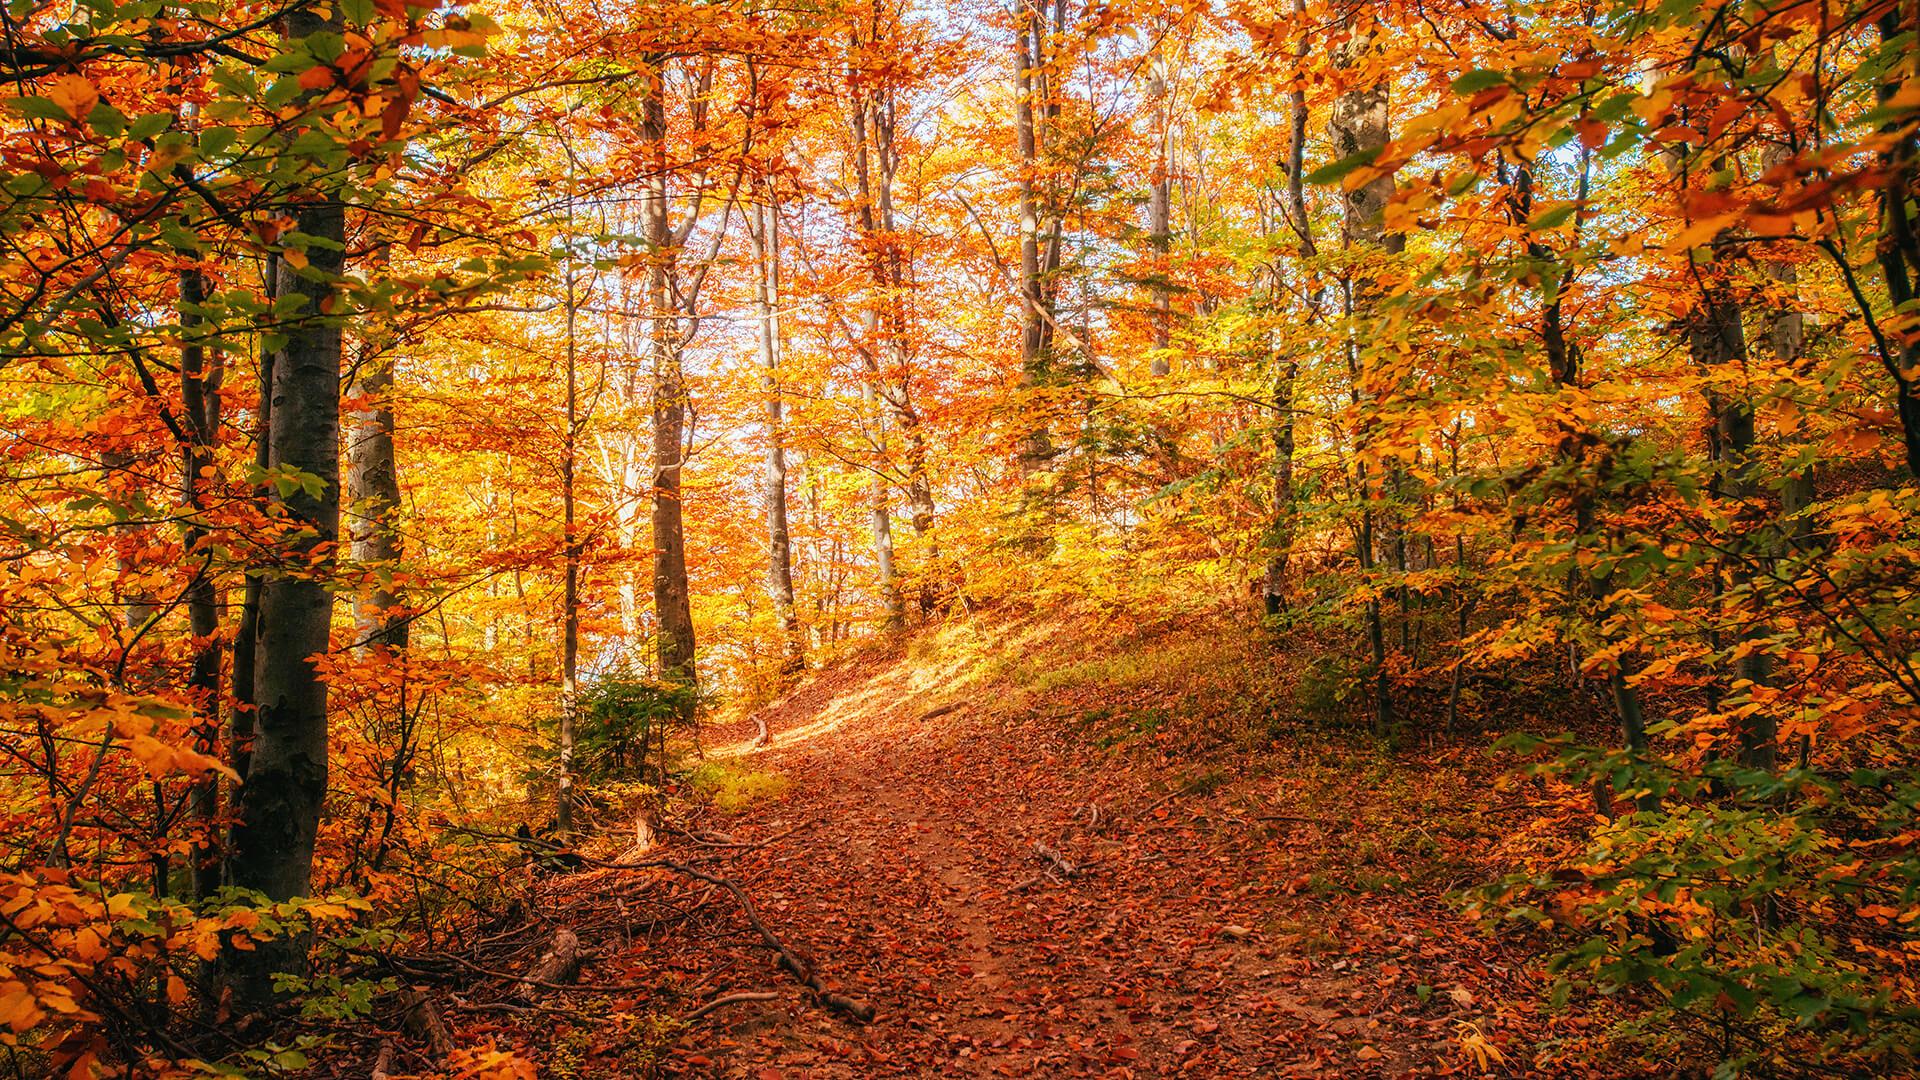 https://endangeredwild.life/wp-content/uploads/2021/05/forest-road-in-the-autumn-landscape-ukraine-europe-small.jpg